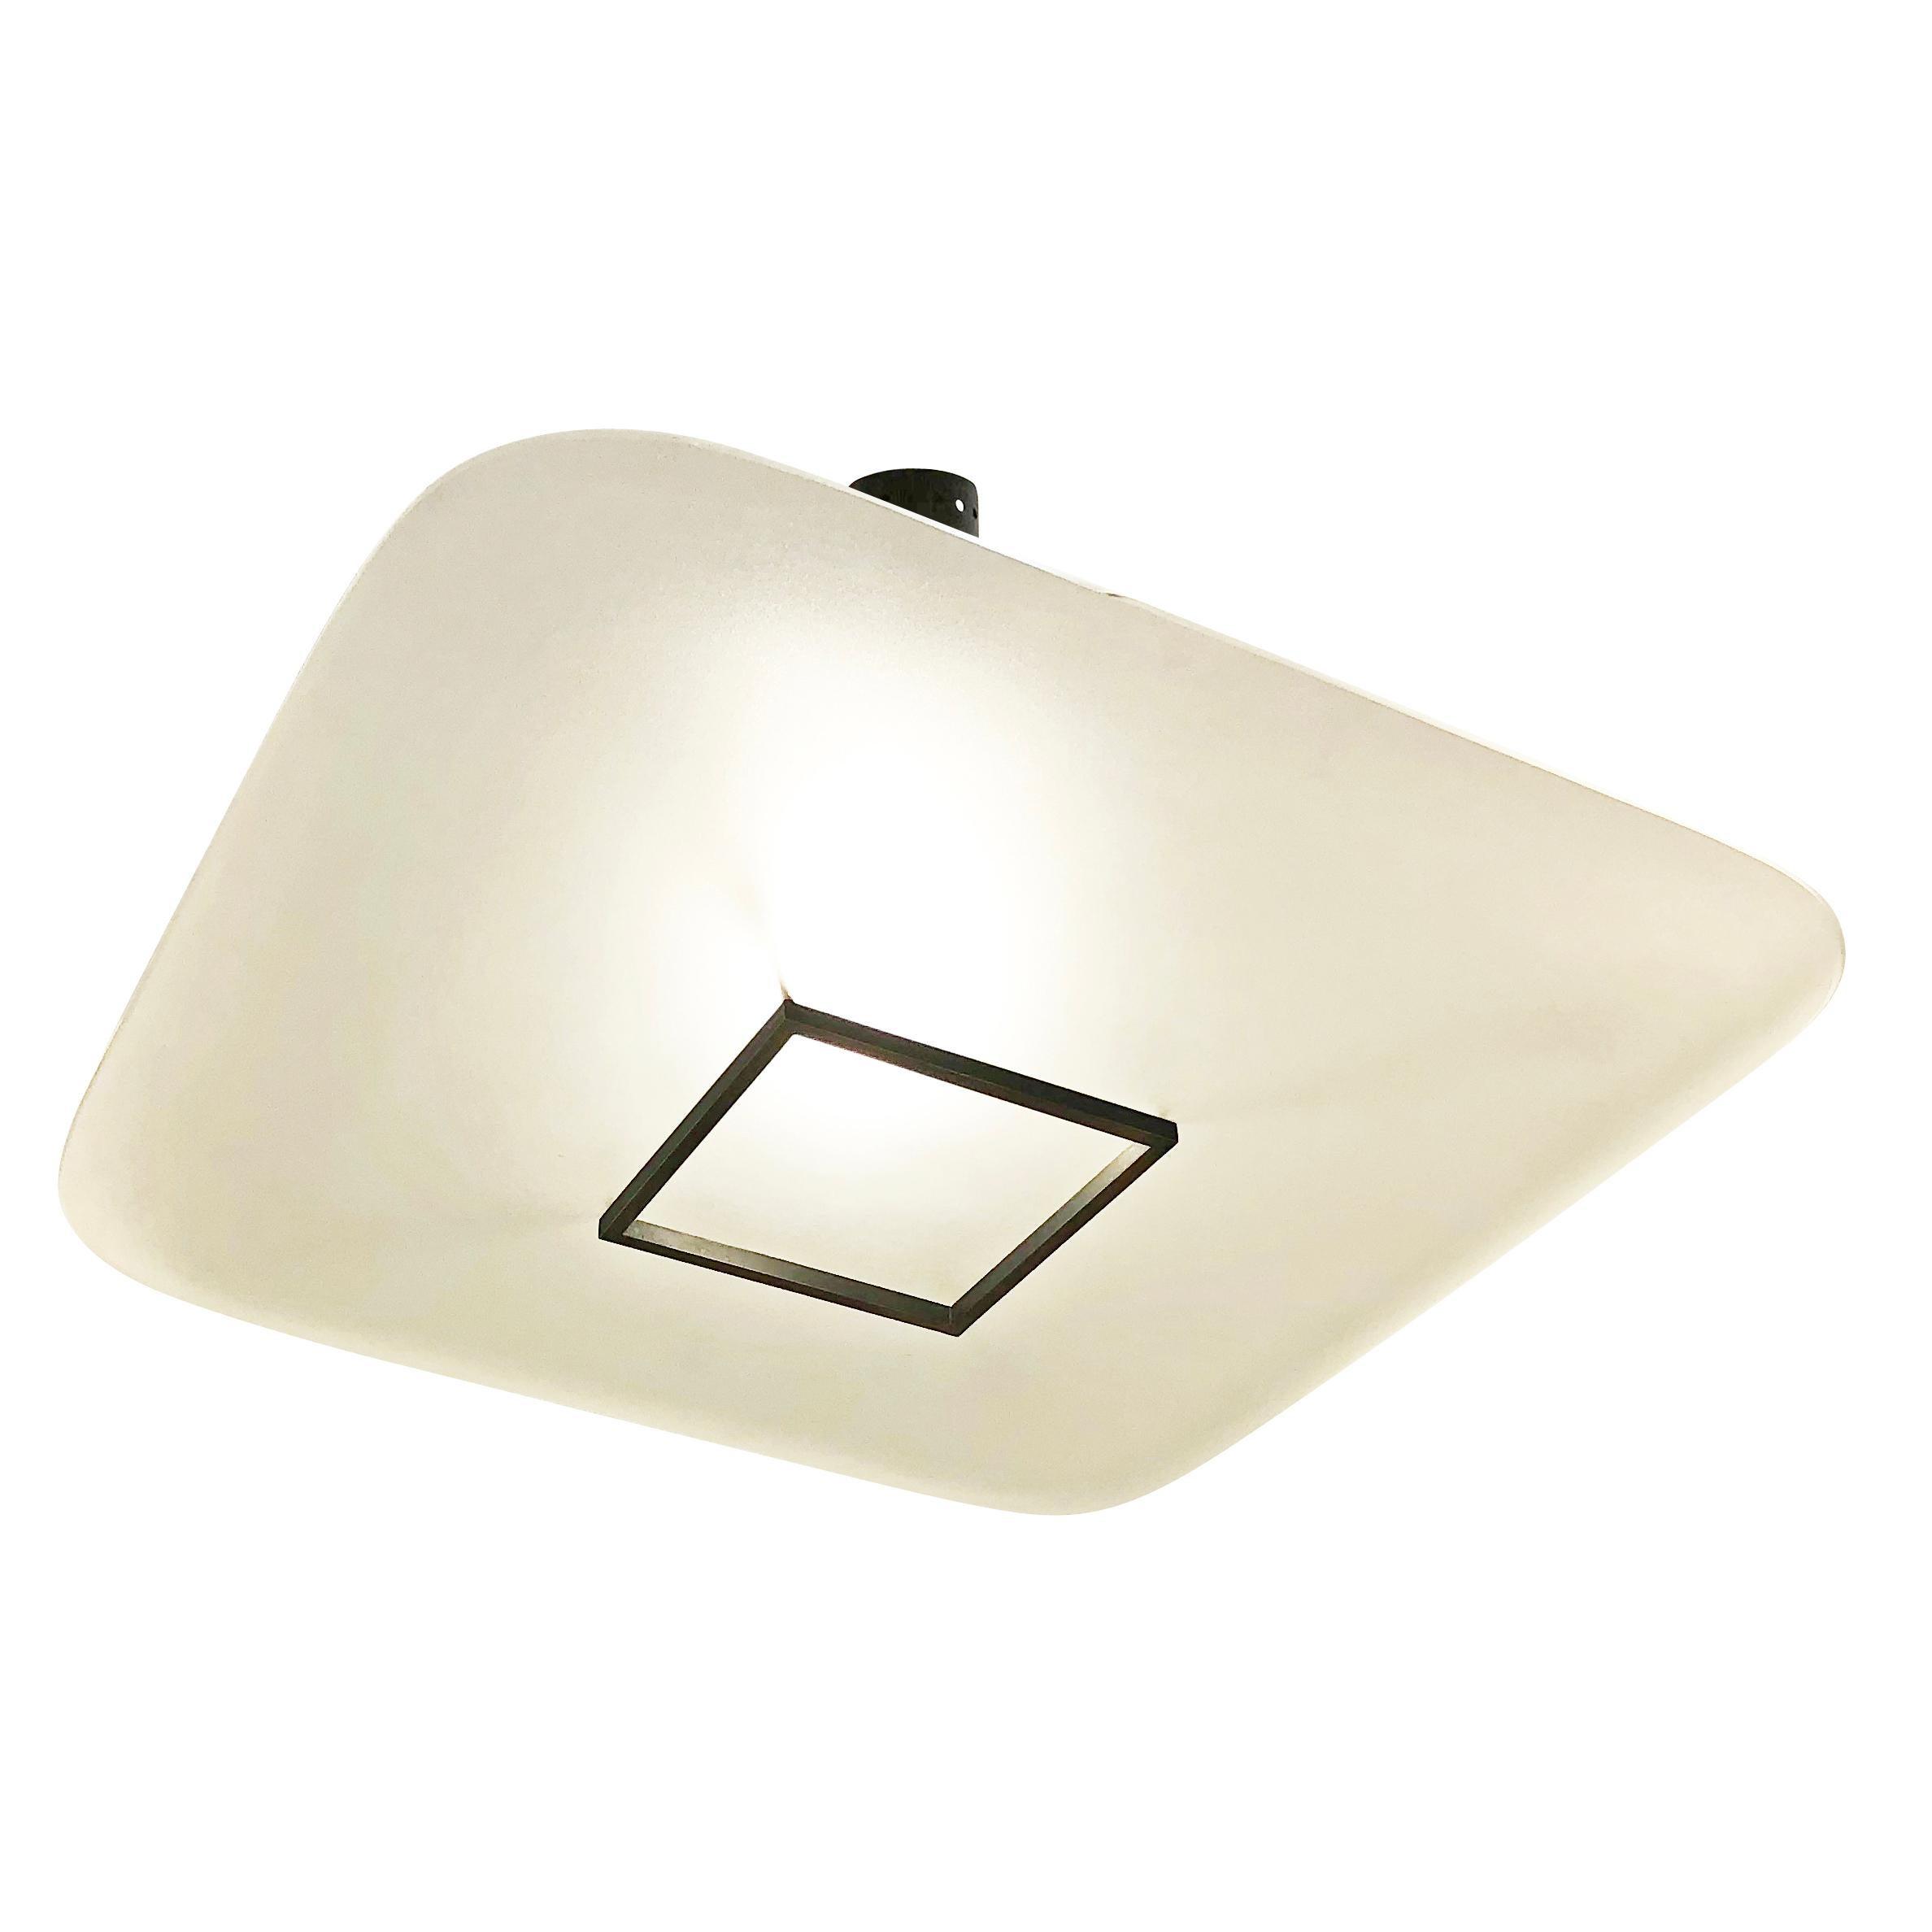 89a050cdf26b Glass Pendant Light Shades - 1104 For Sale on 1stdibs